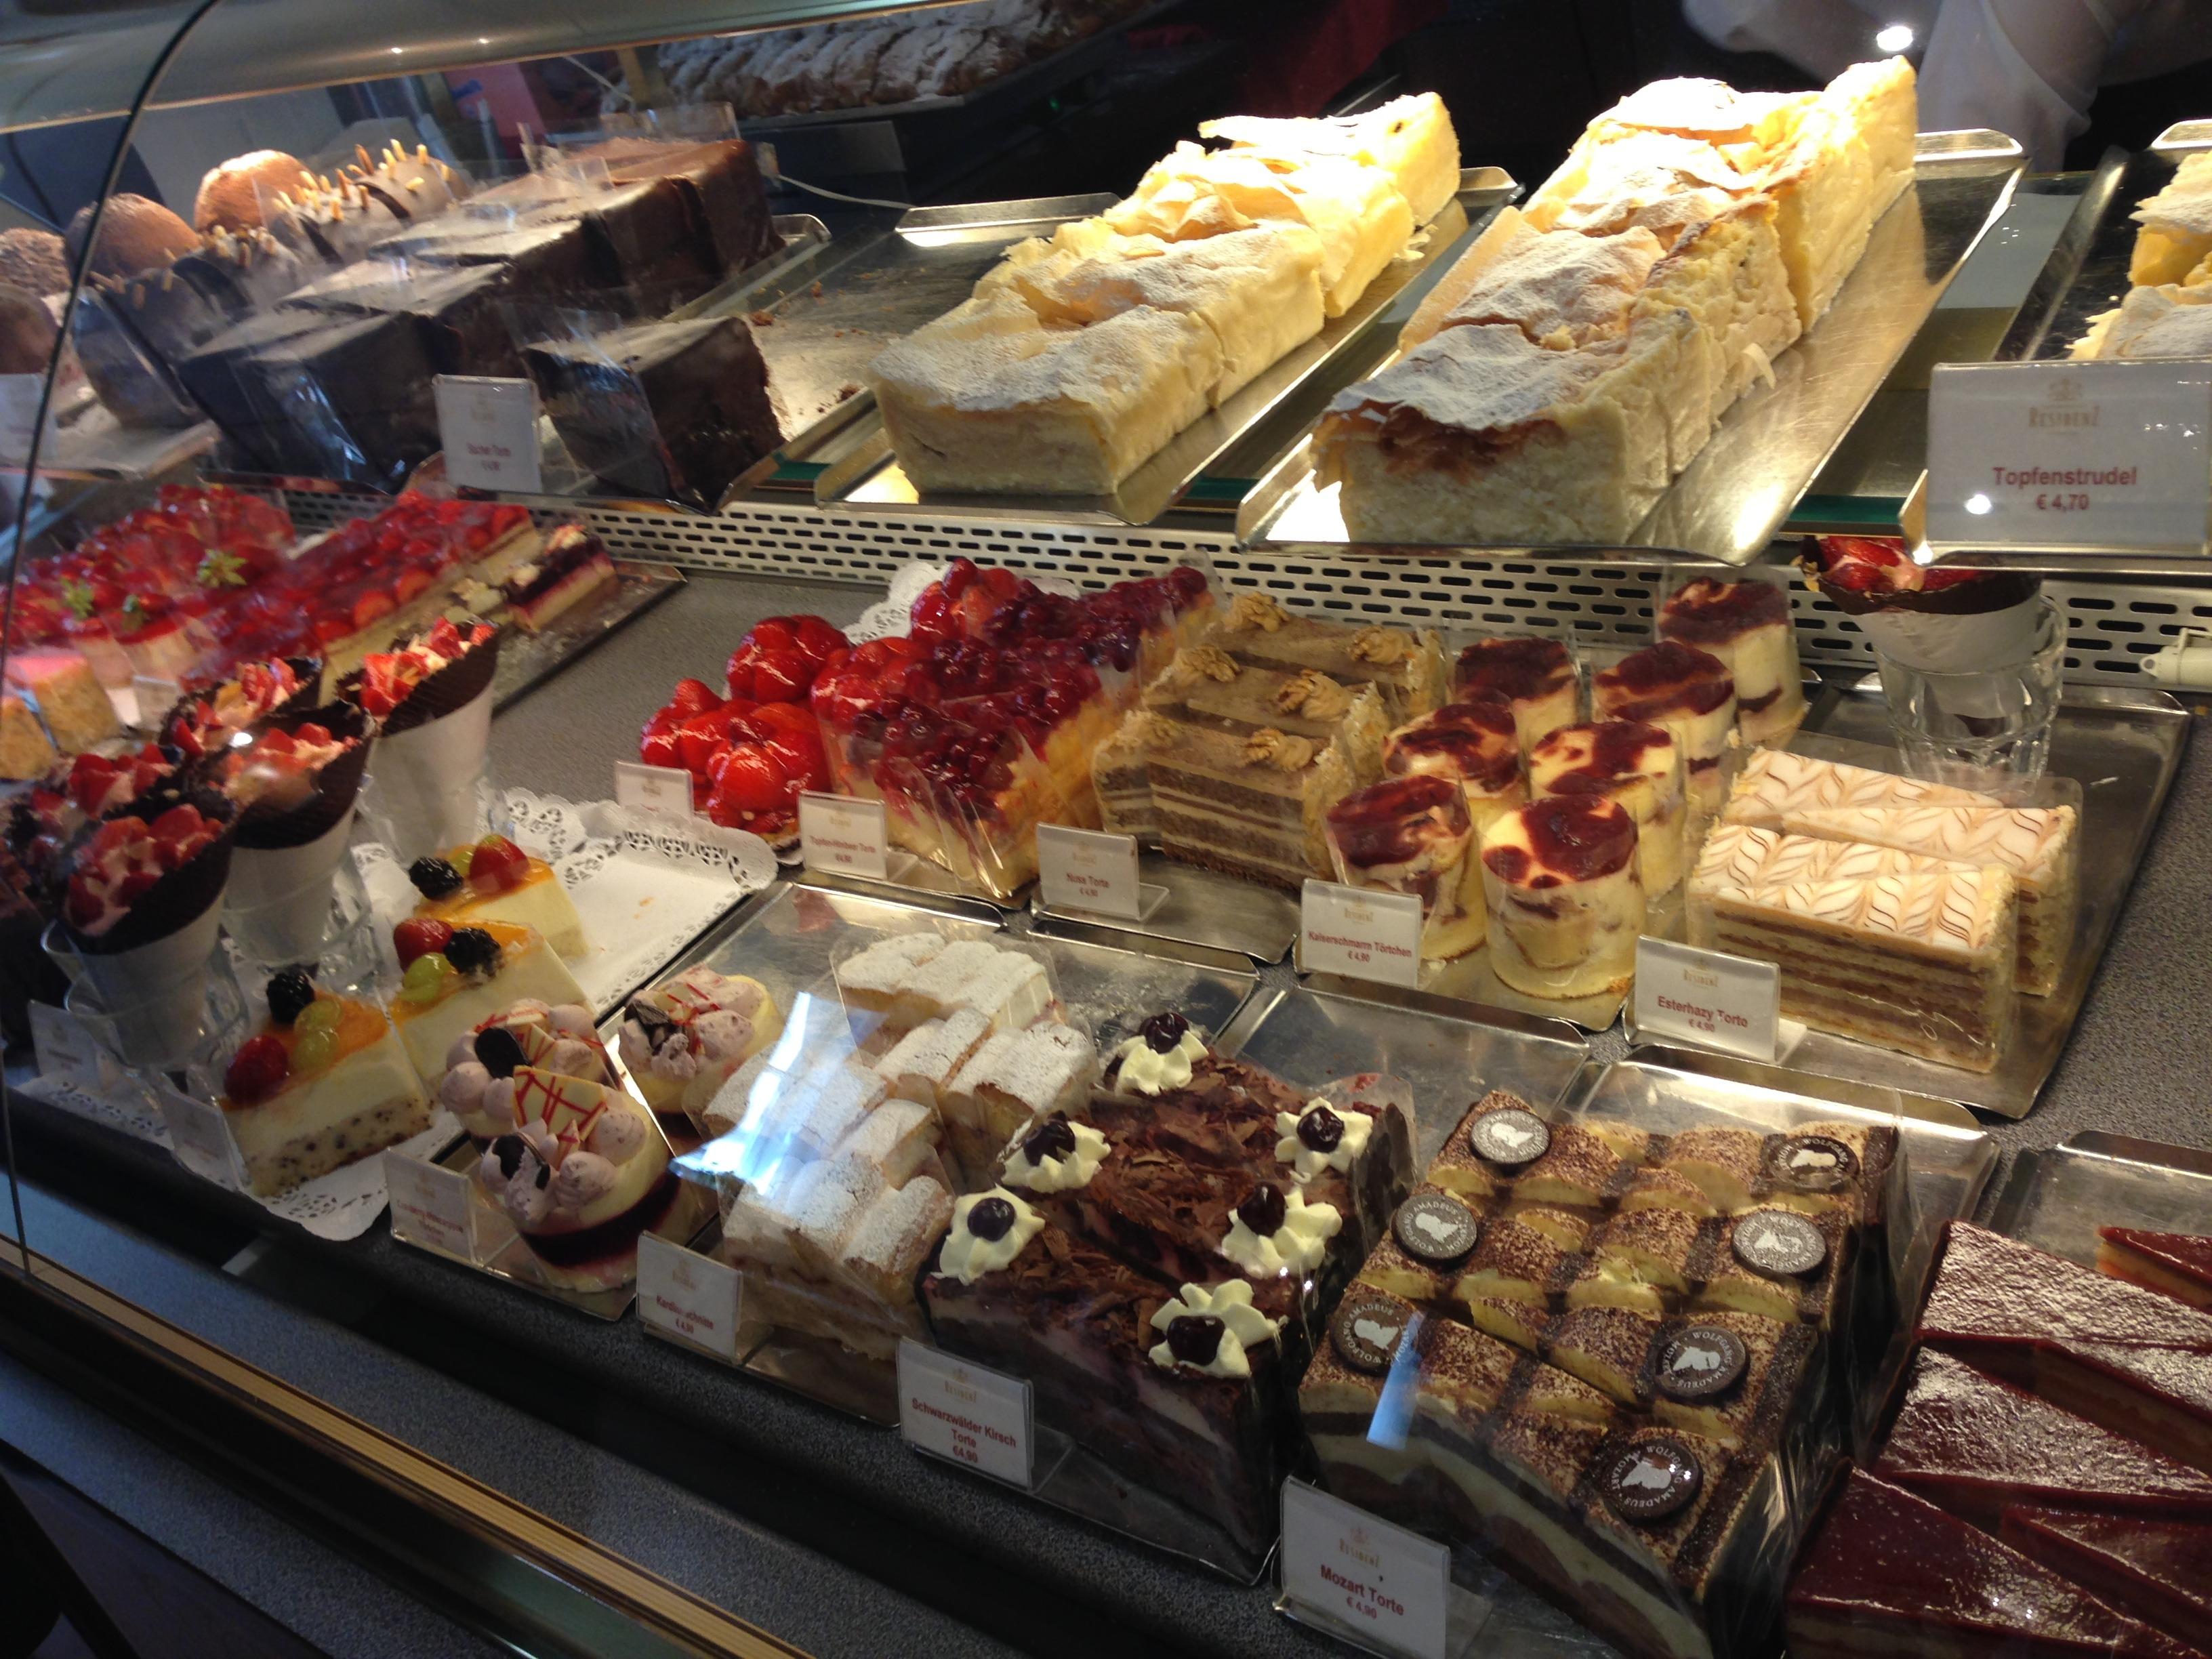 Clairmont Cake Website